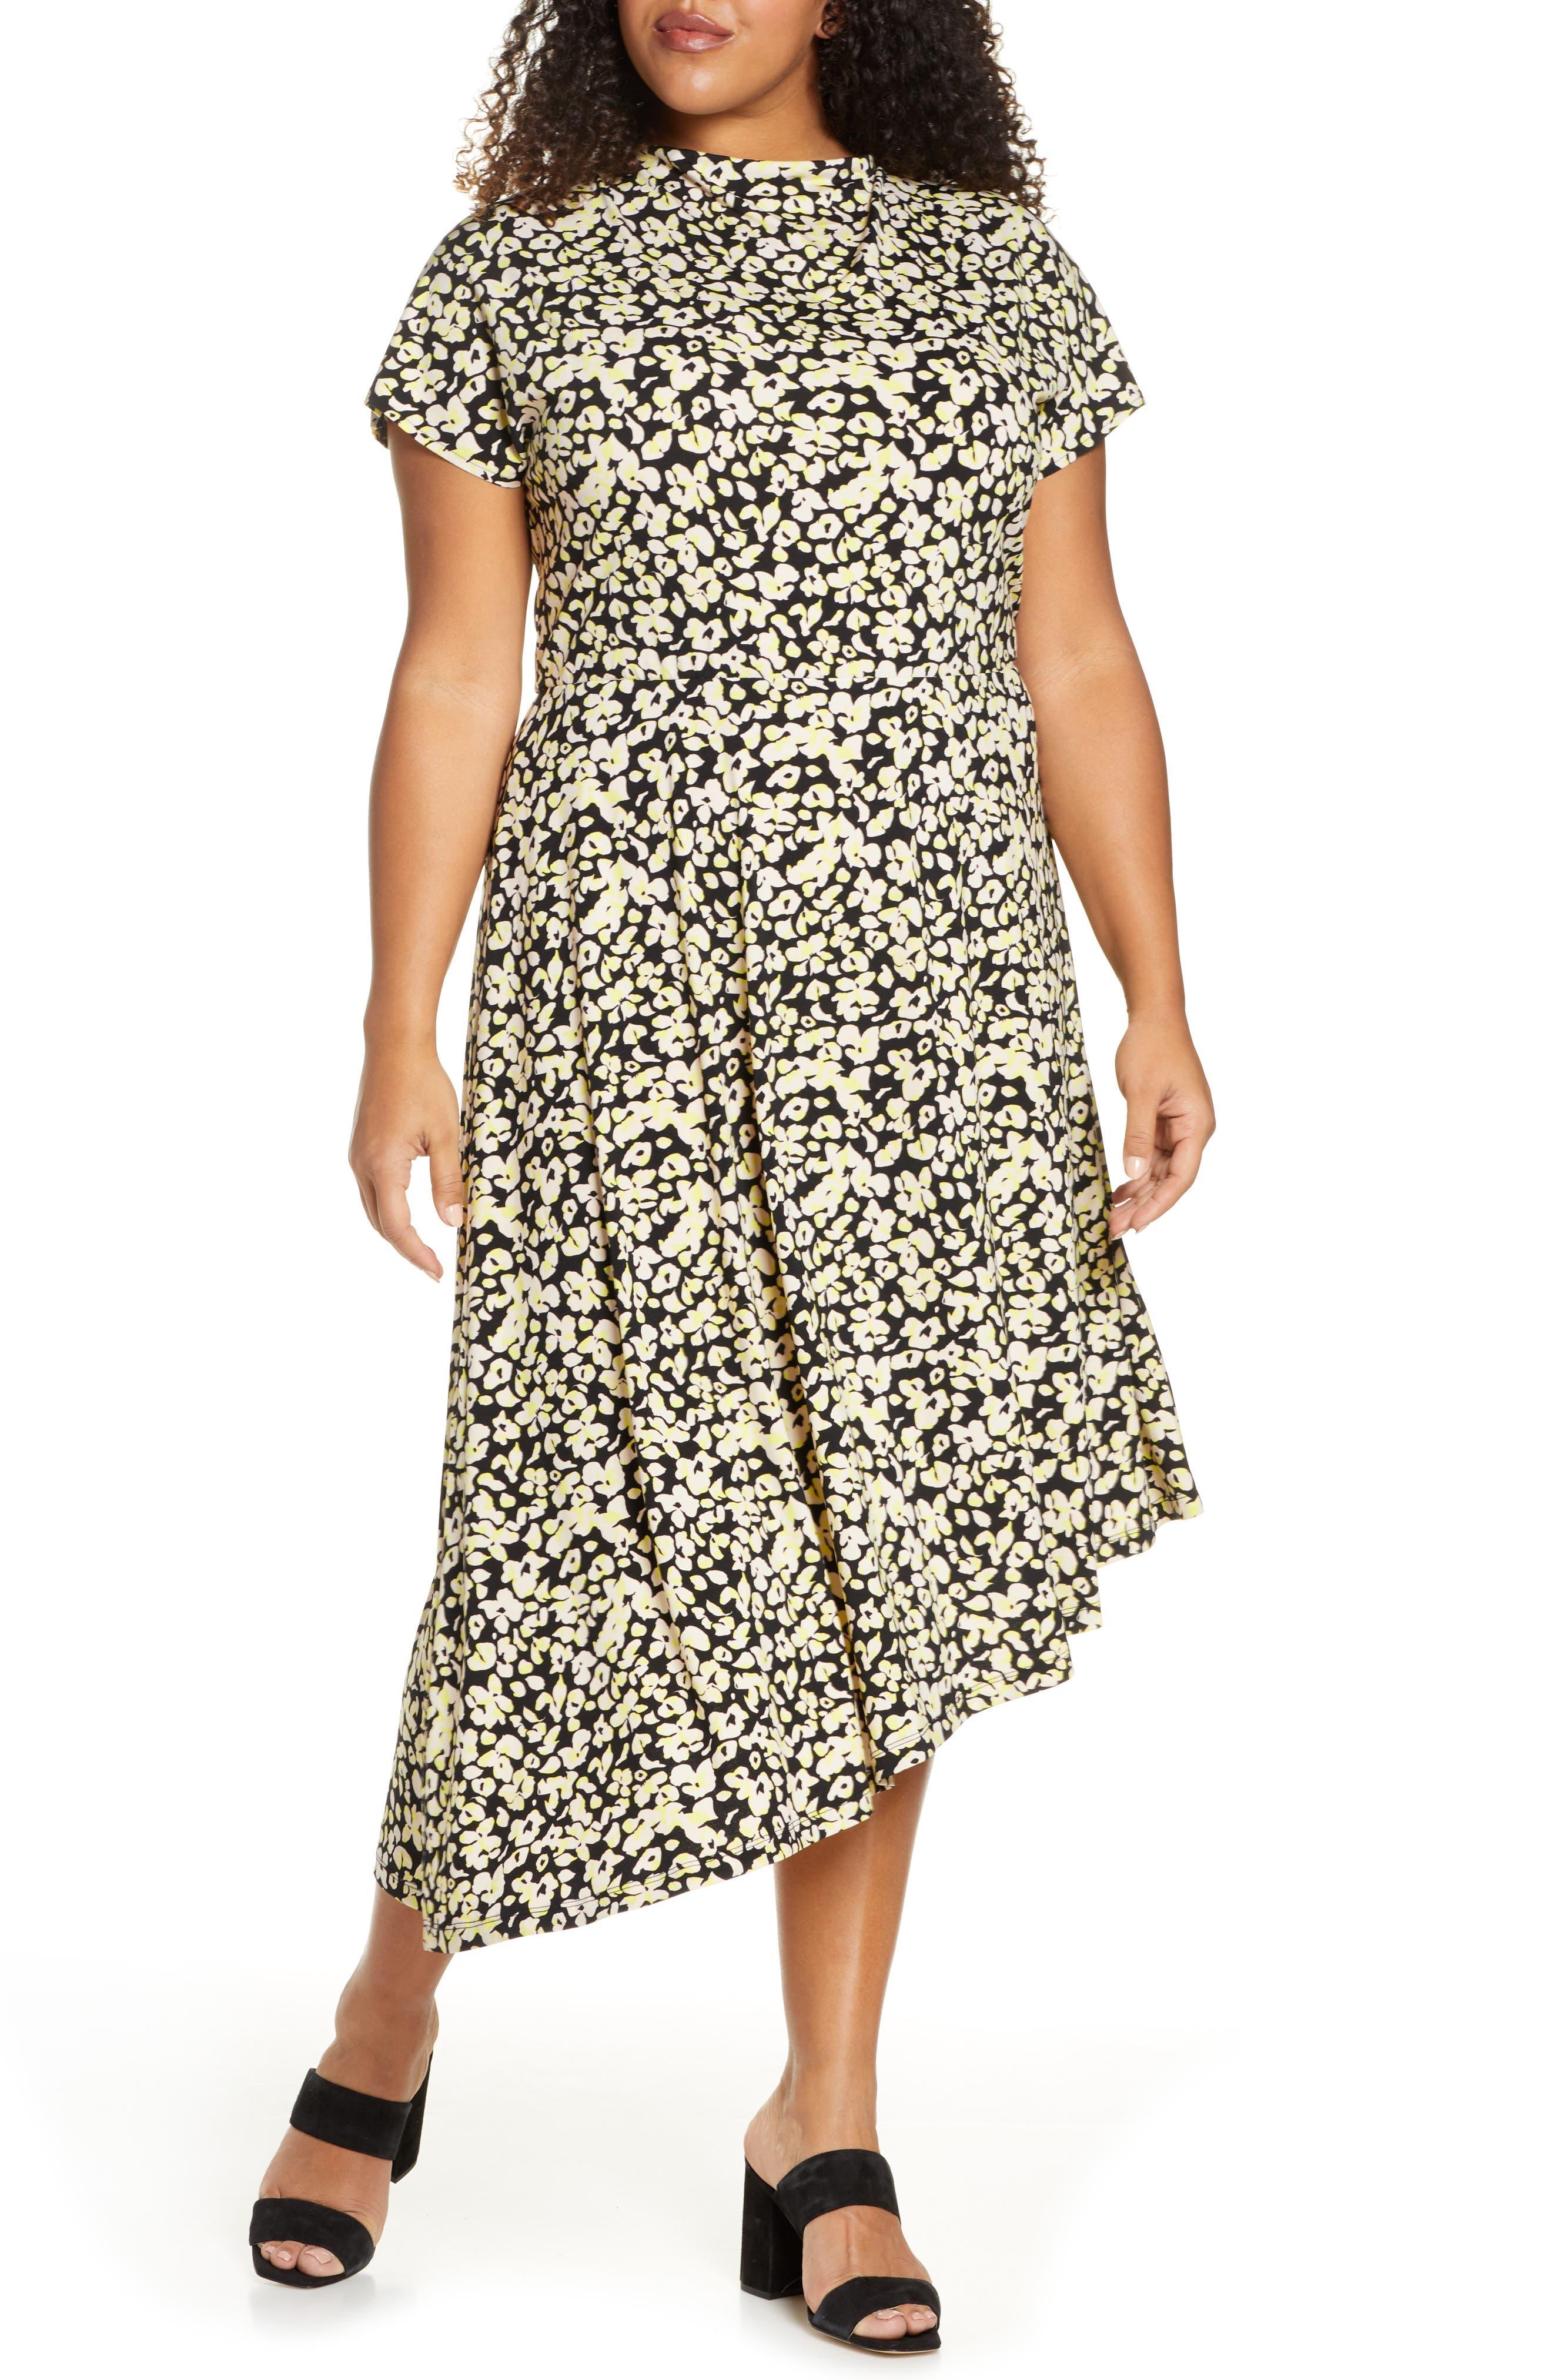 Vintage 1920s Dresses – Where to Buy Plus Size Womens Eloquii Floral Asymmetrical Hem Stretch Jersey Midi Dress $79.95 AT vintagedancer.com